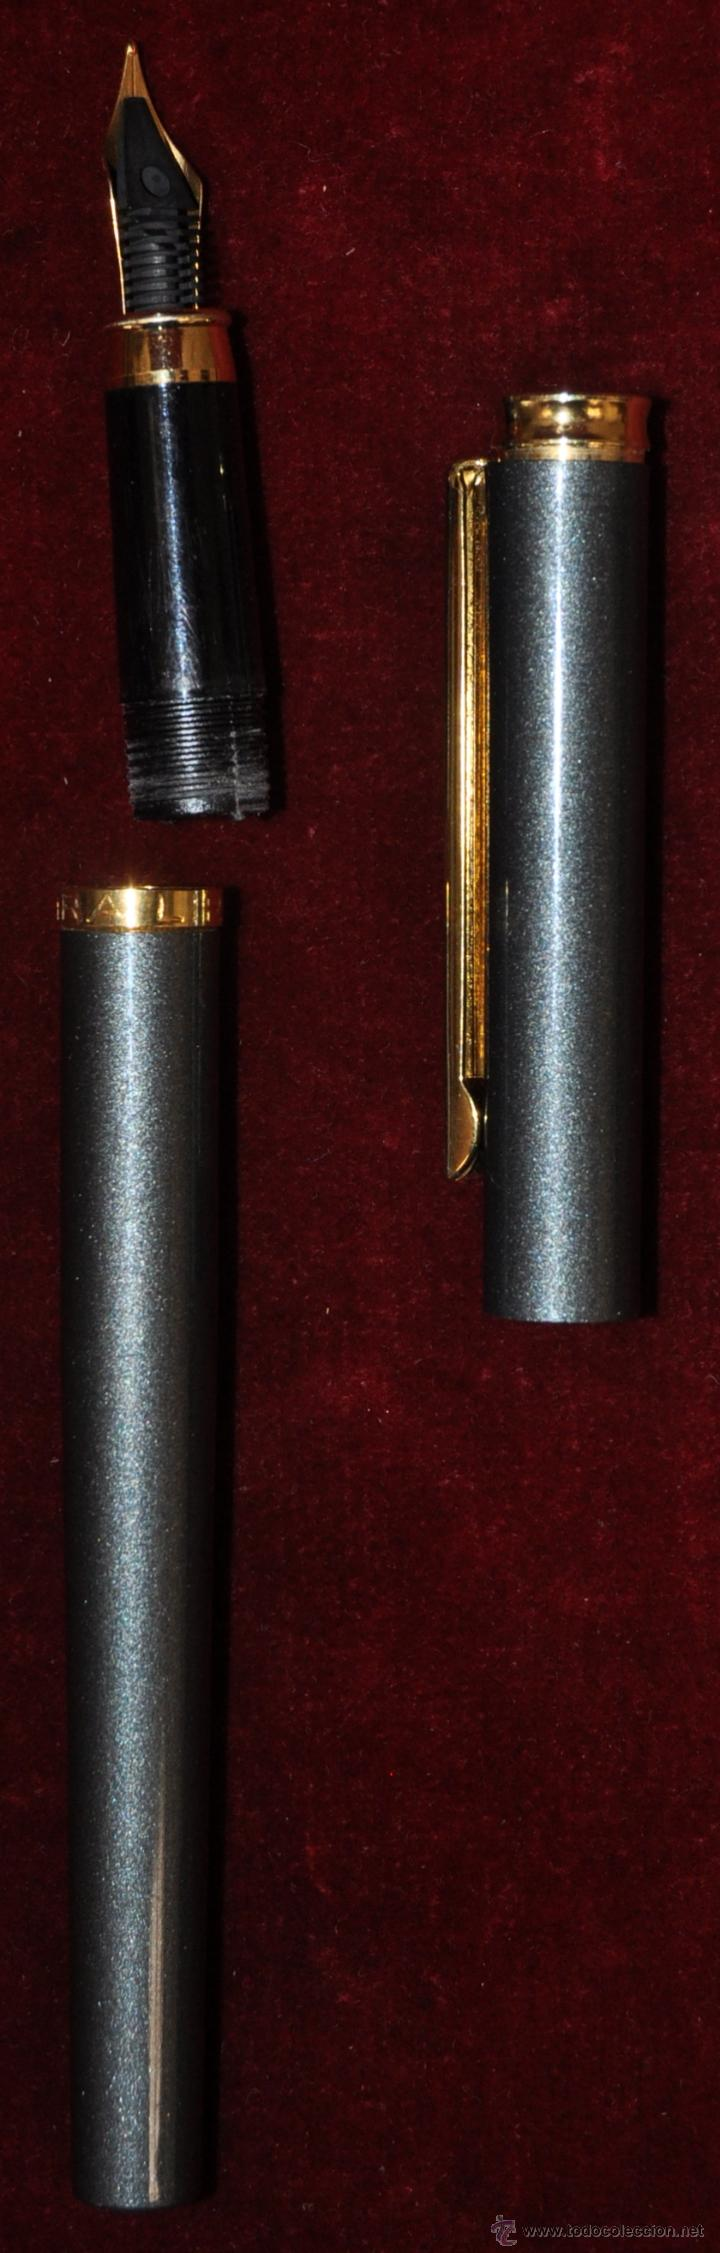 Plumas estilográficas antiguas: ANTIGUA PLUMA DE FABRICACION ALEMANA IRIDIUM POINT. AÑOS 50-60 - Foto 5 - 45307354